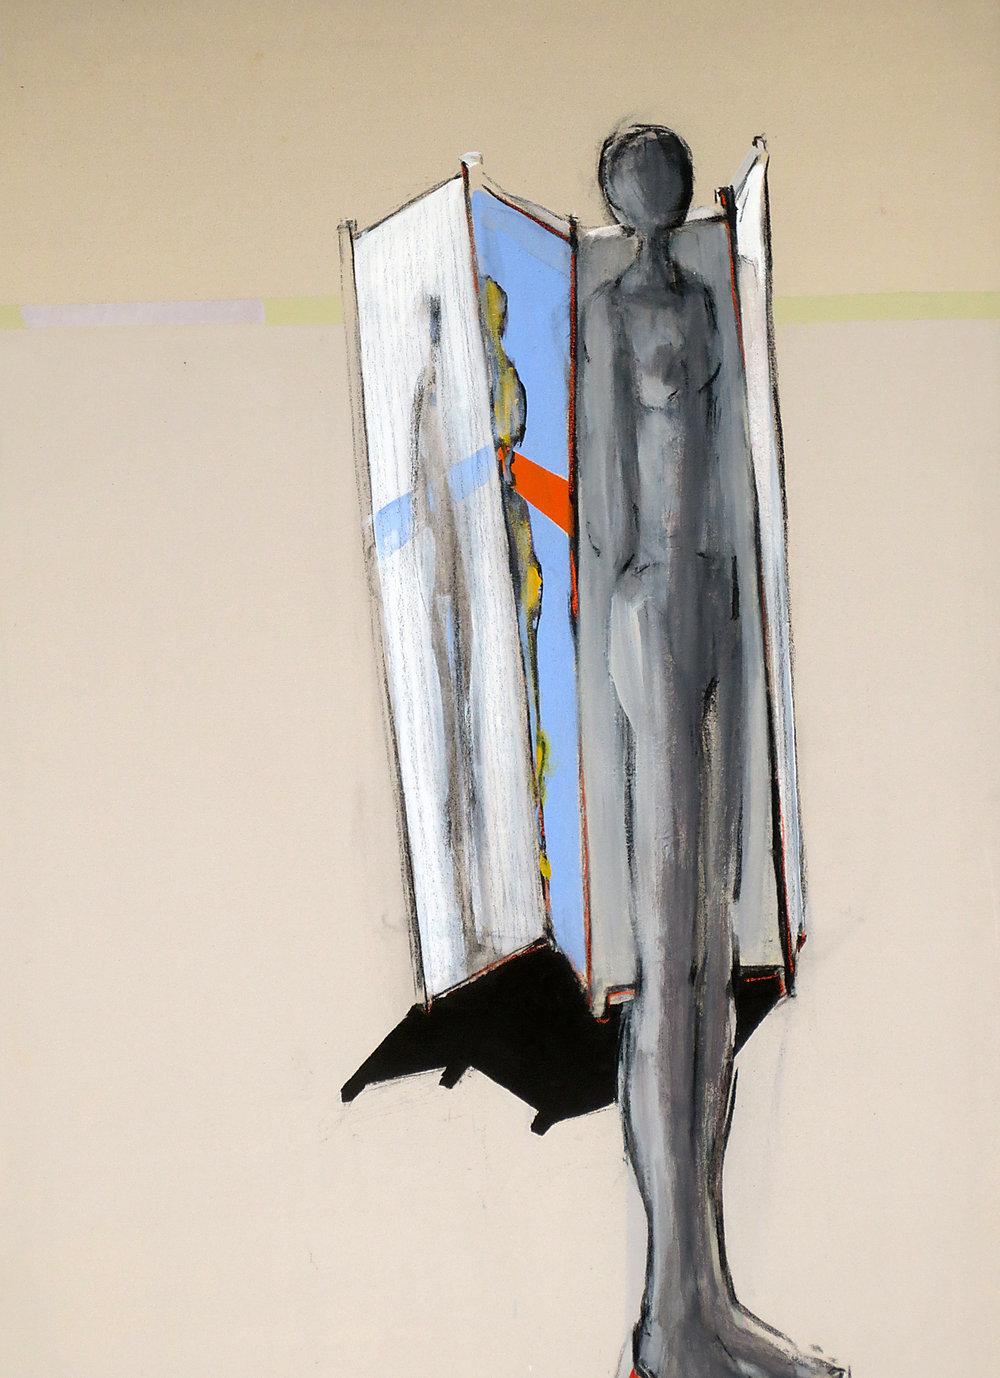 Paravent VI, Acryl auf Leinwand 135 x 95 cm